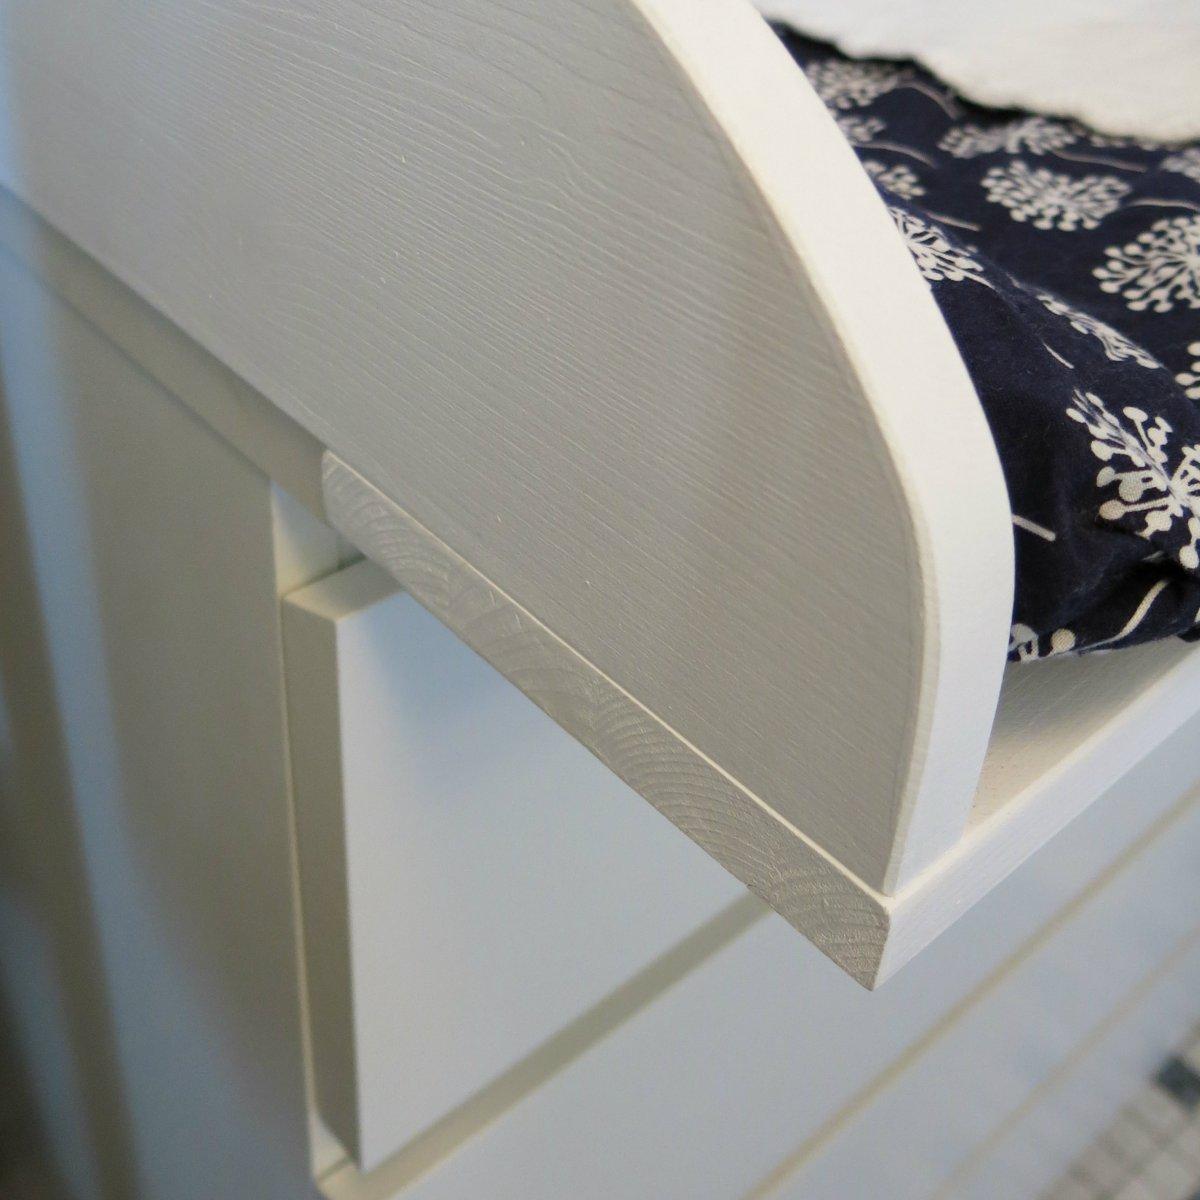 ikea kommode zur wickelkommode. Black Bedroom Furniture Sets. Home Design Ideas